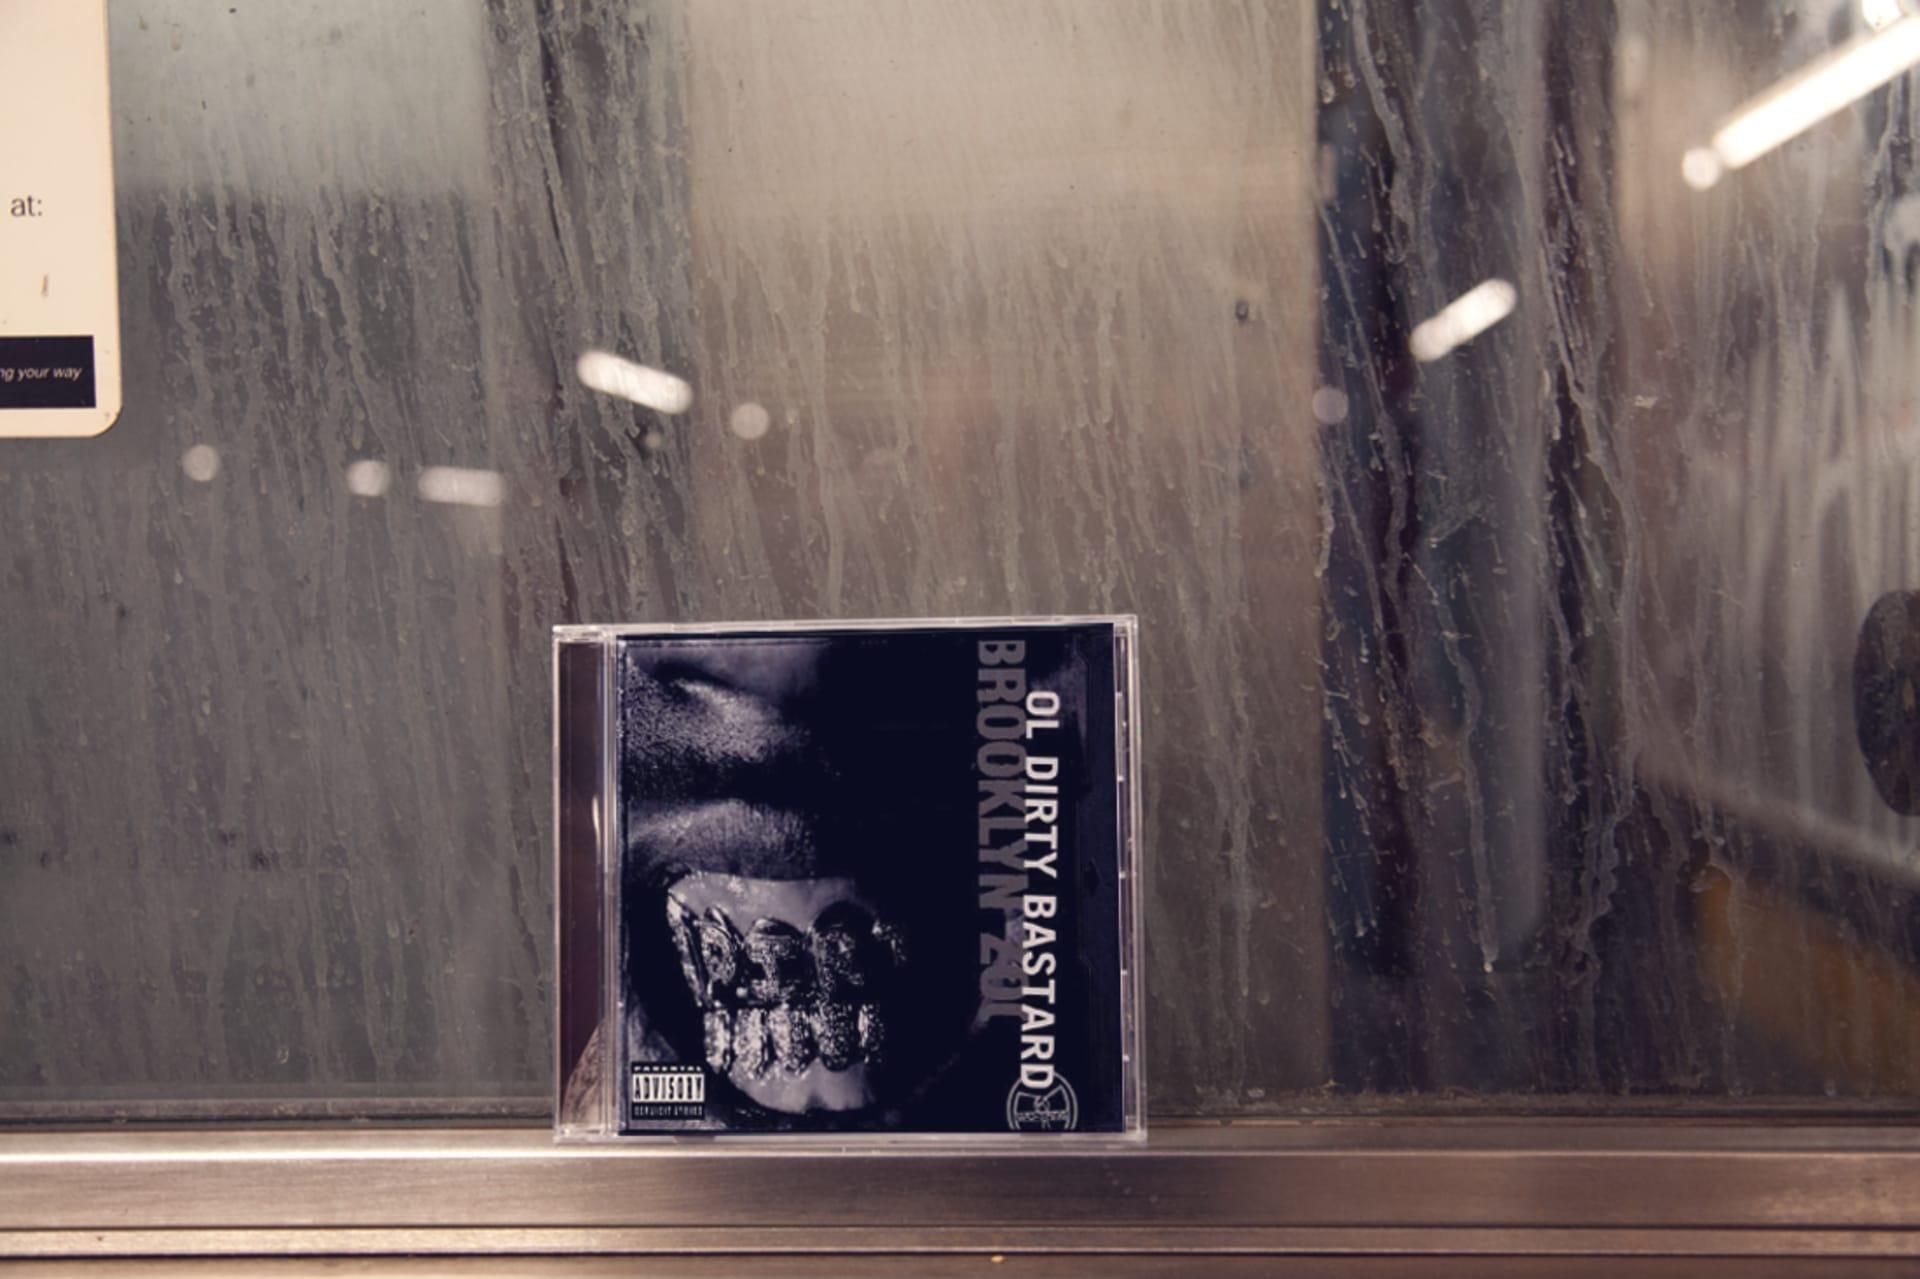 100 Best New York City Rap Songs Complex 1995 Infinity Eagle Fuse Box Diagram Ol Dirty Bastard Brooklyn Zoo